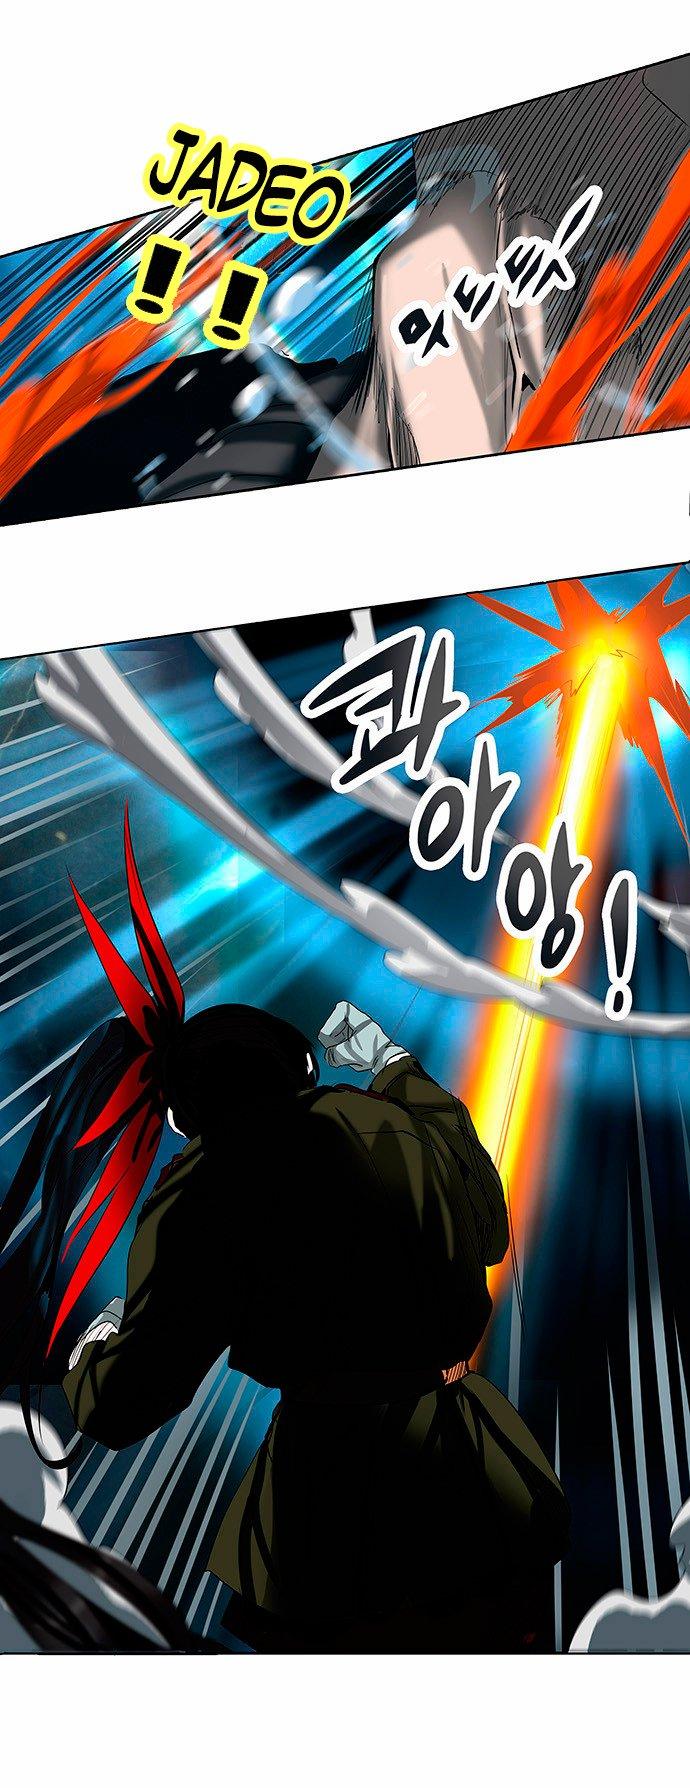 http://c5.ninemanga.com/es_manga/21/149/449229/06b21cad18b0960f8f72a5800c5ce811.jpg Page 47